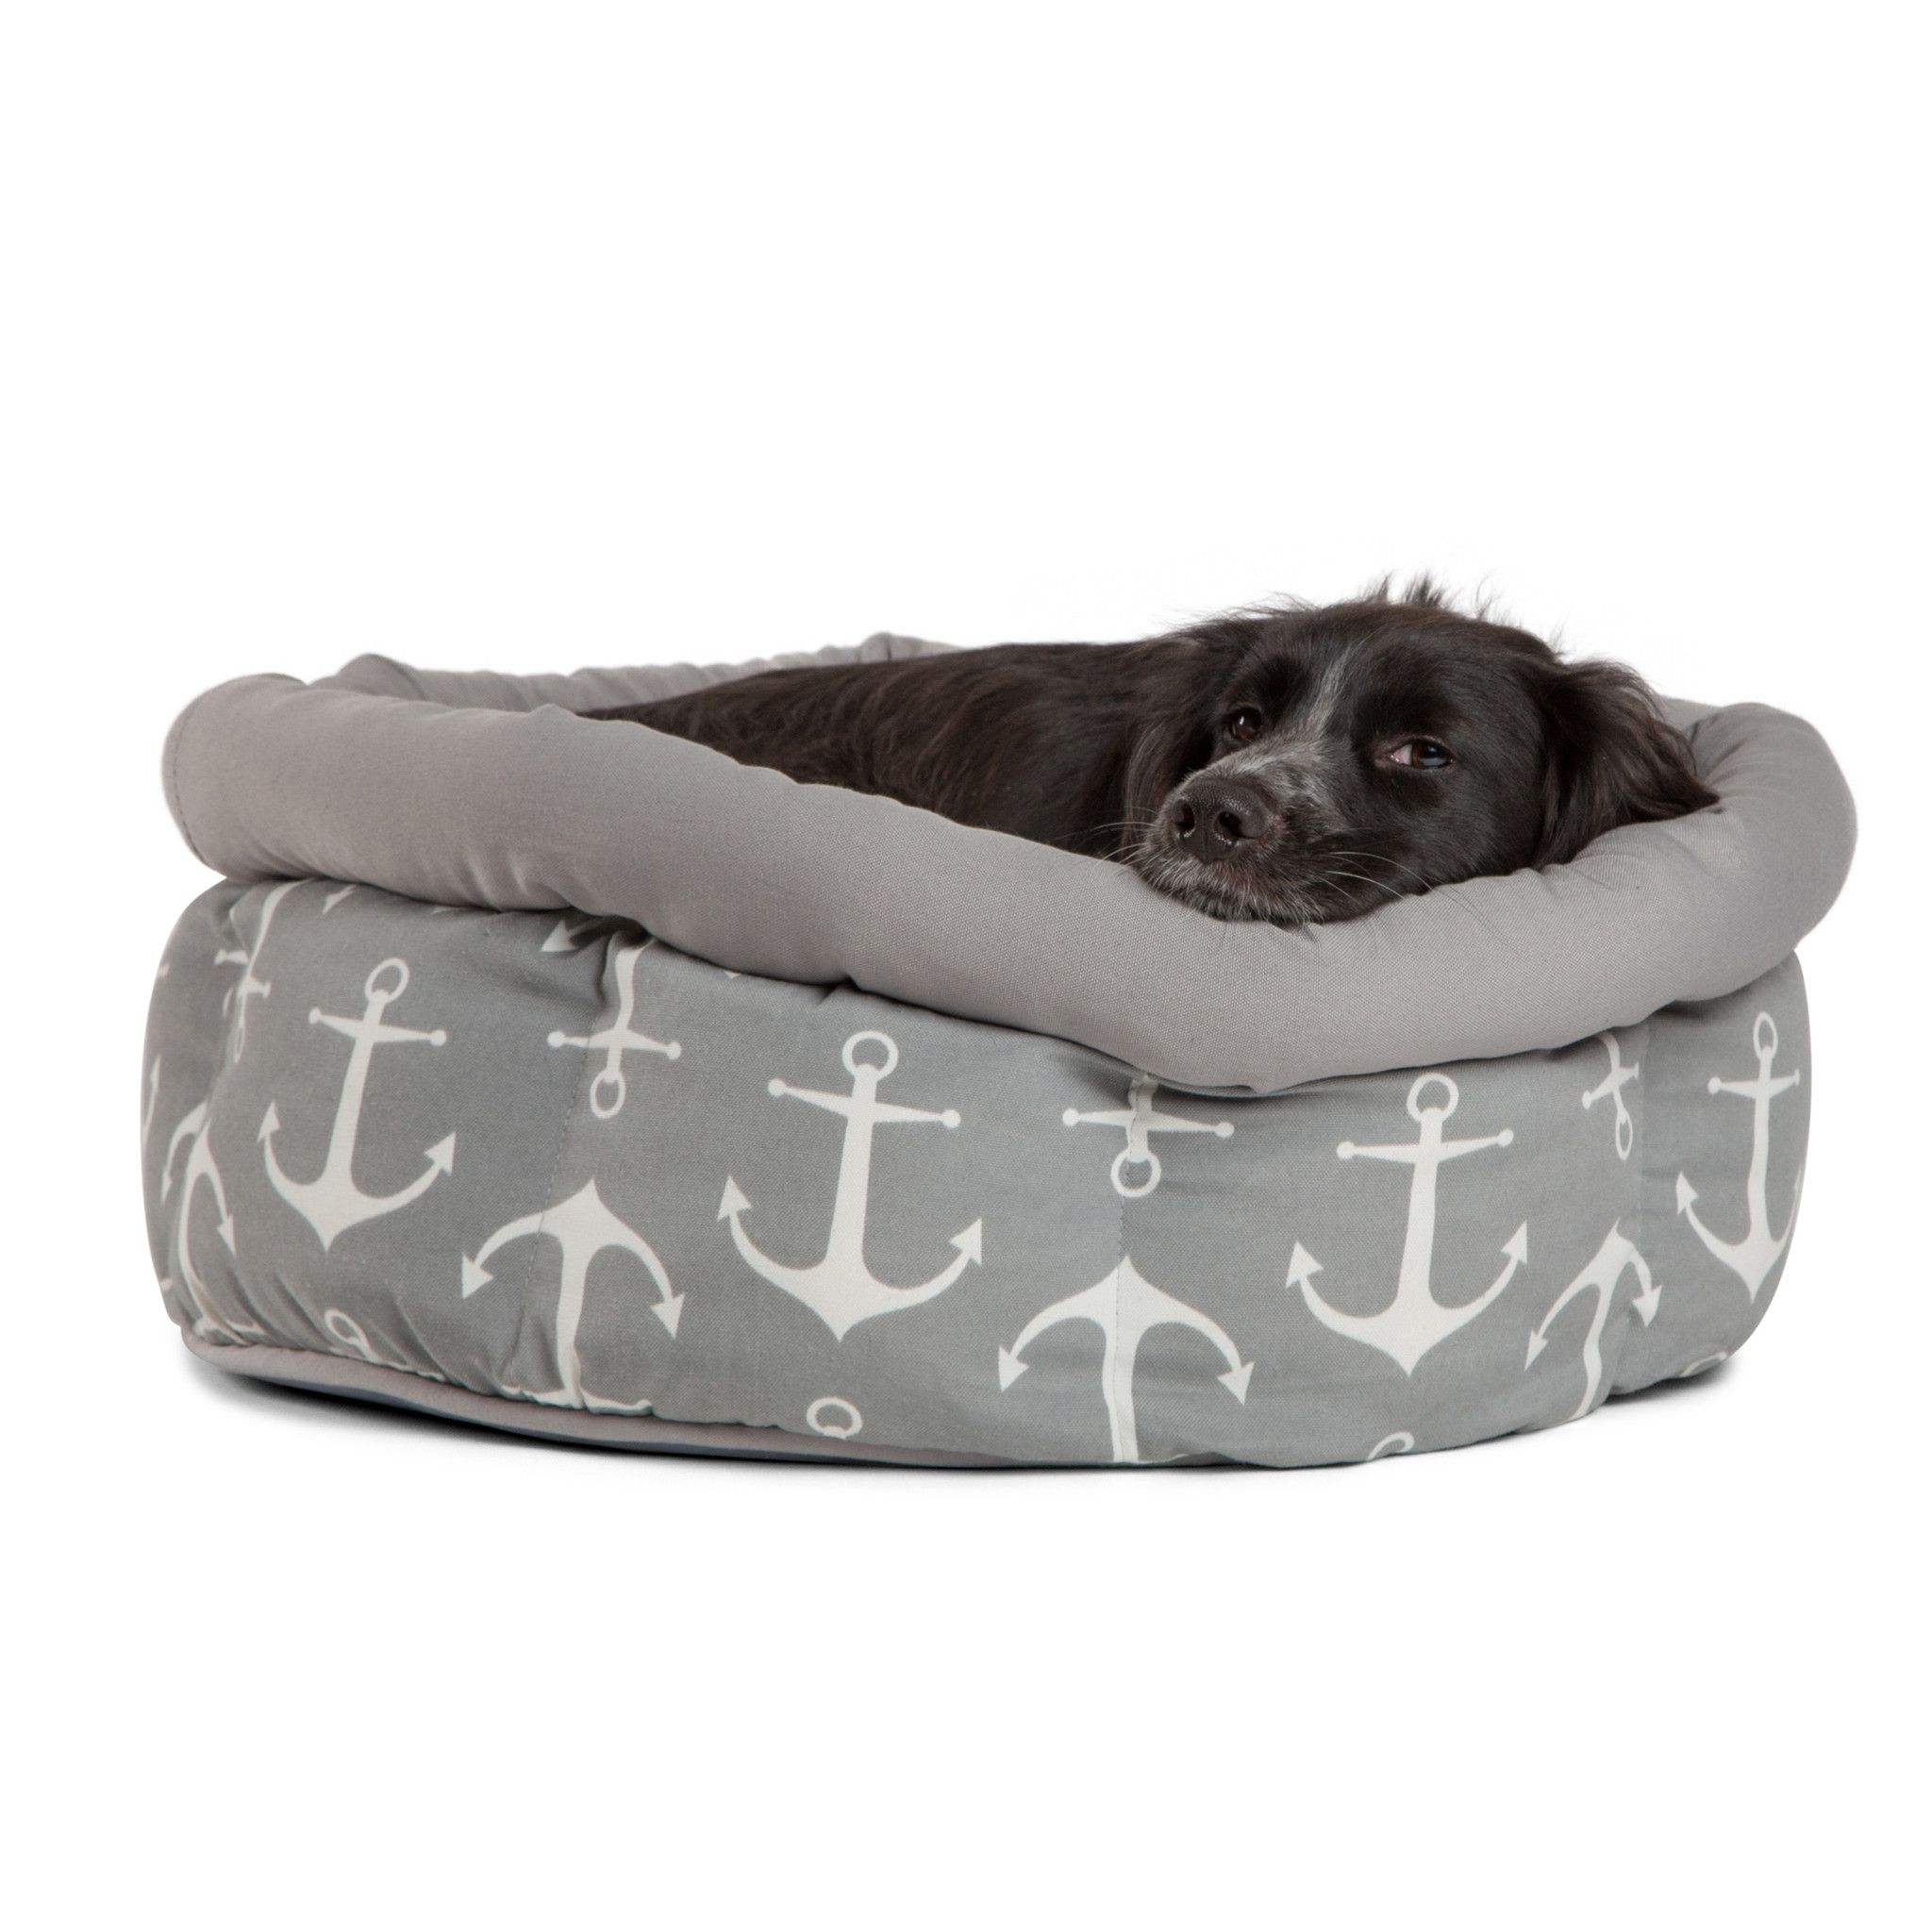 Teddy Cuddler In Anchor Fog Jumbo Grey Dog Bed Dog Bed Furniture Dog Bed